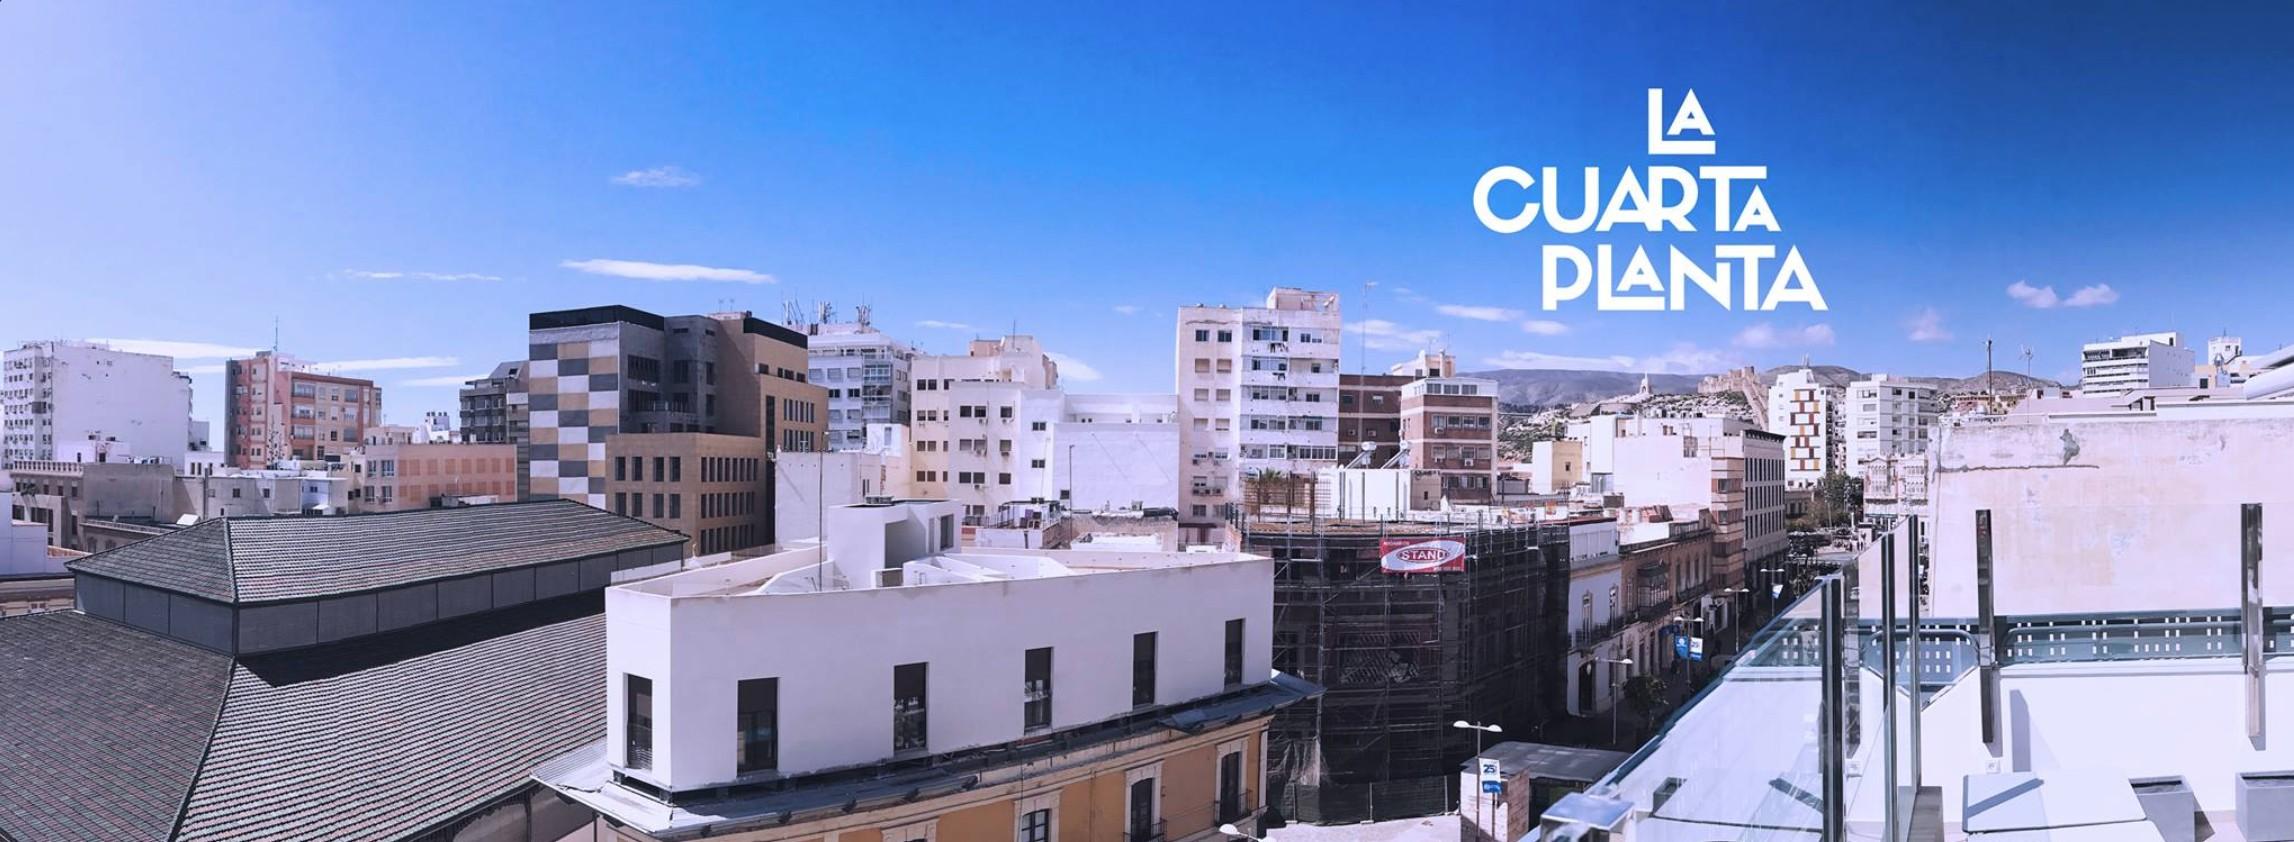 La Cuarta Planta | LinkedIn